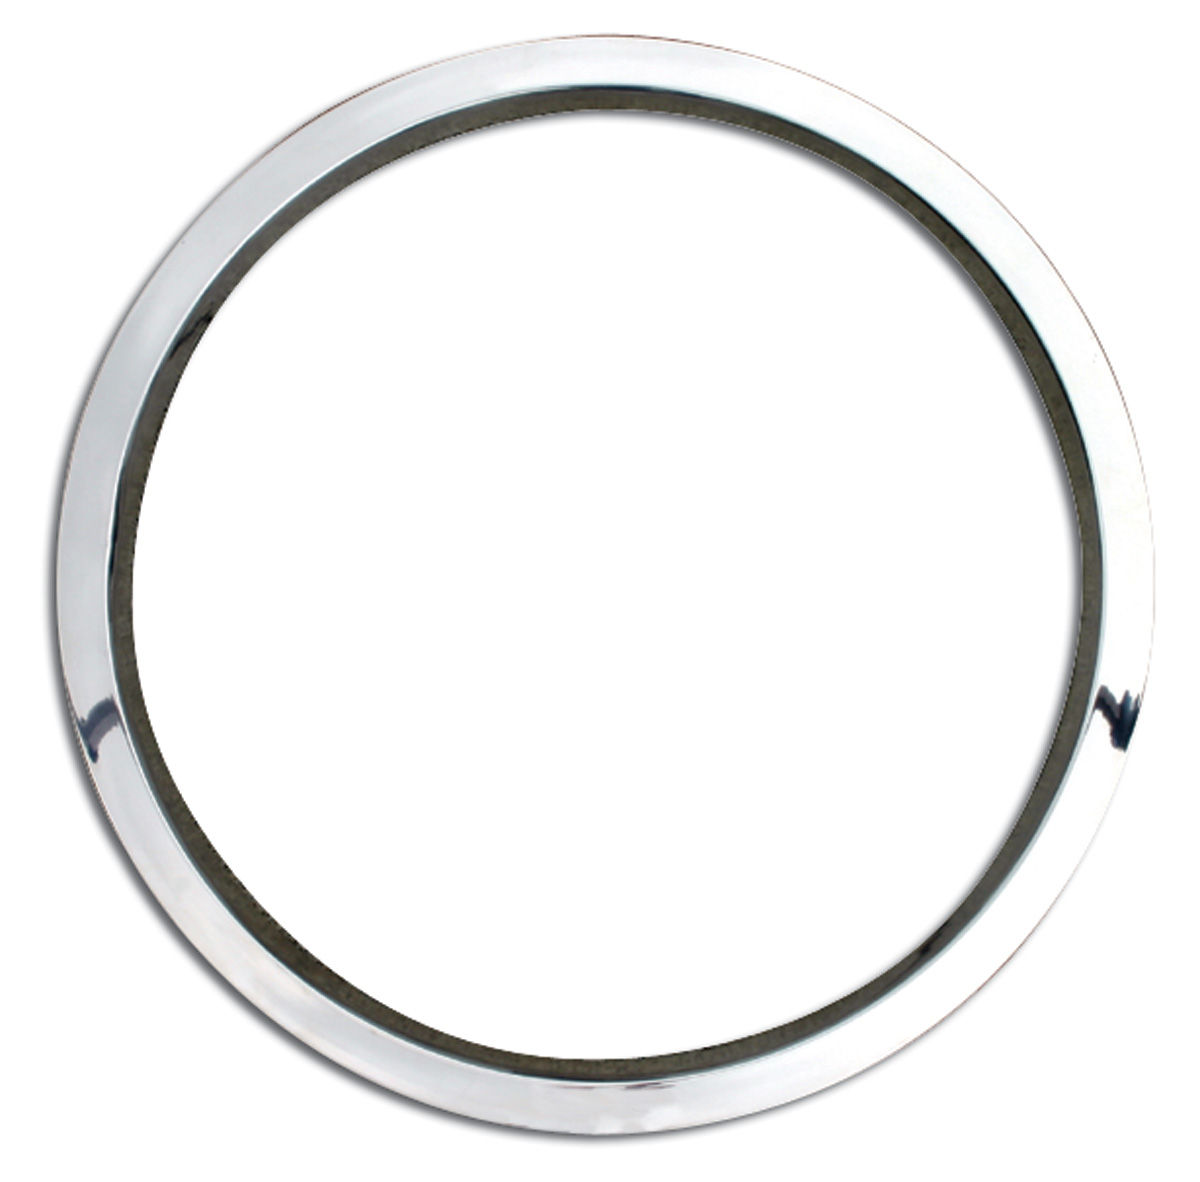 Trim Ring, Honeycomb Wheel, 1971-73 G/T/L, 15